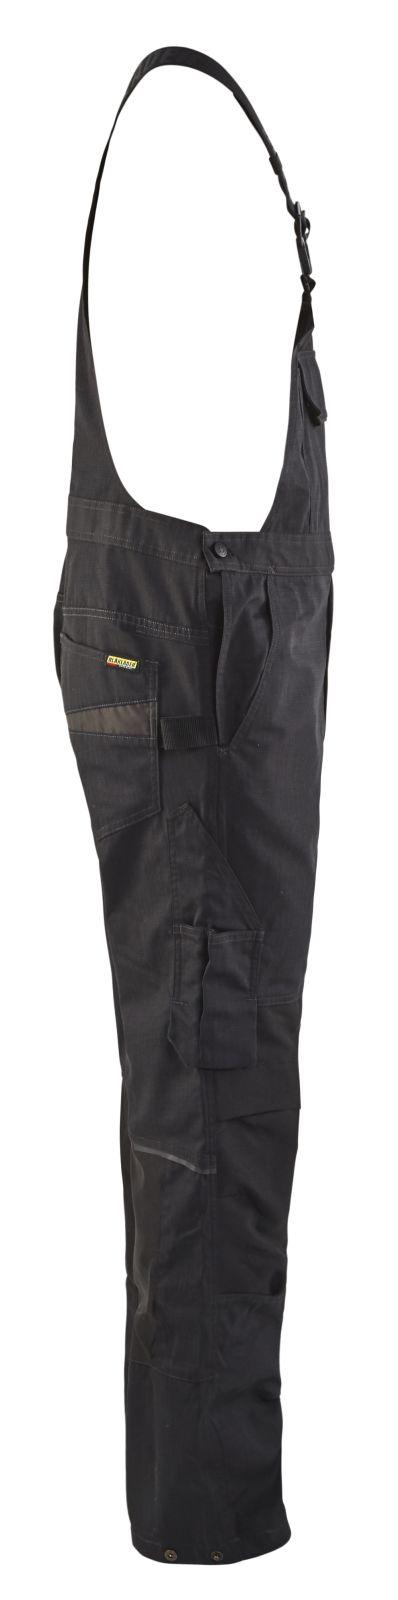 Blaklader Amerikaanse overalls 26951330 met Stretch zwart-grijs(9998)